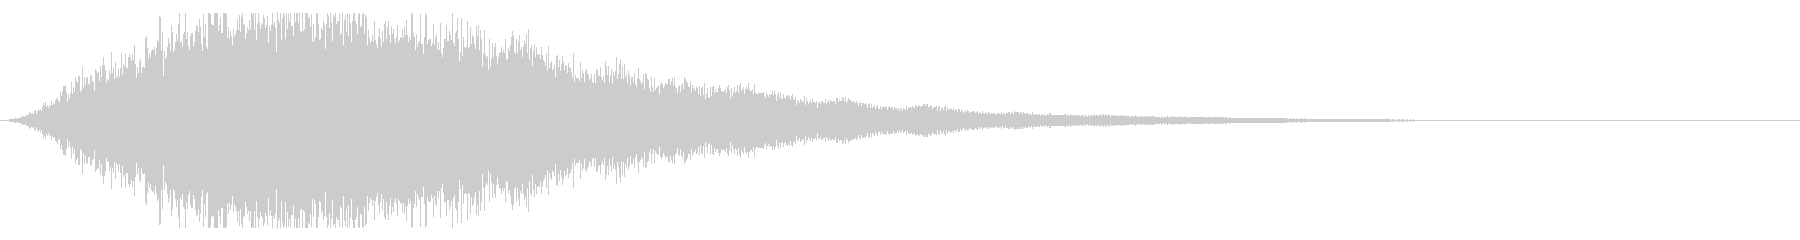 Dark_Attack-51の未再生の波形